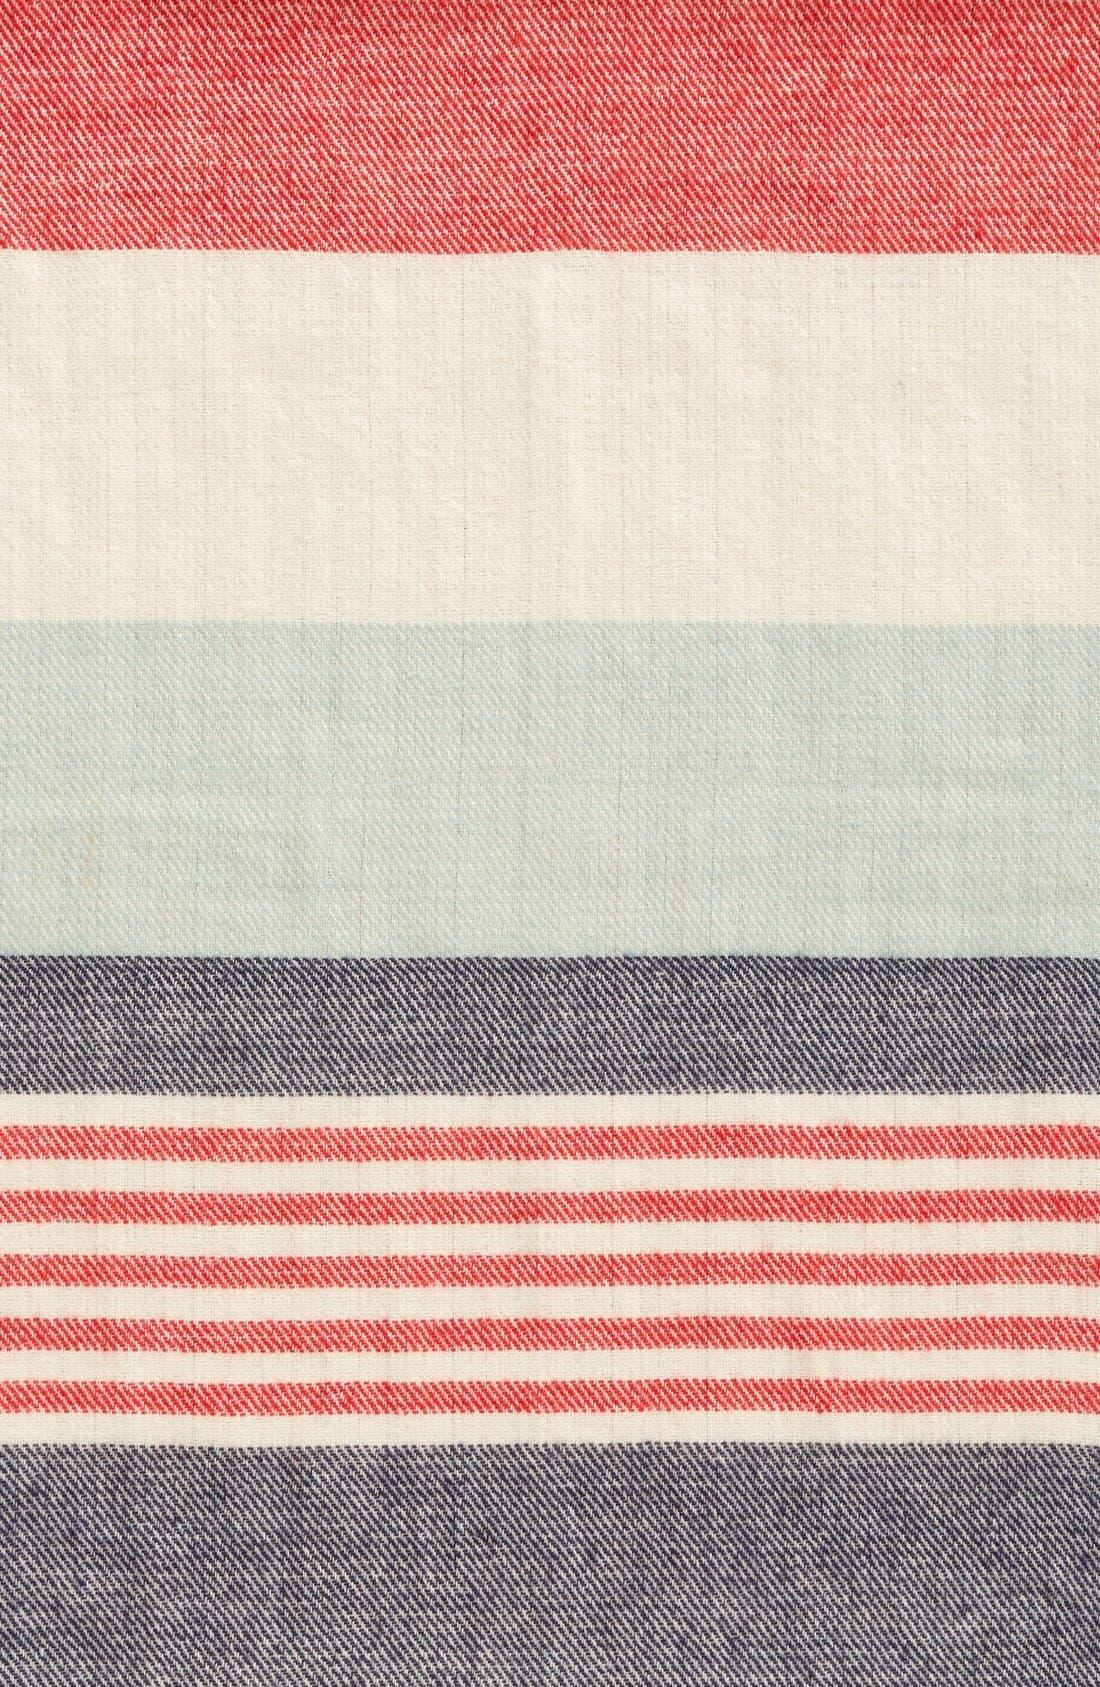 Alternate Image 3  - BP. Stripe Infinity Scarf